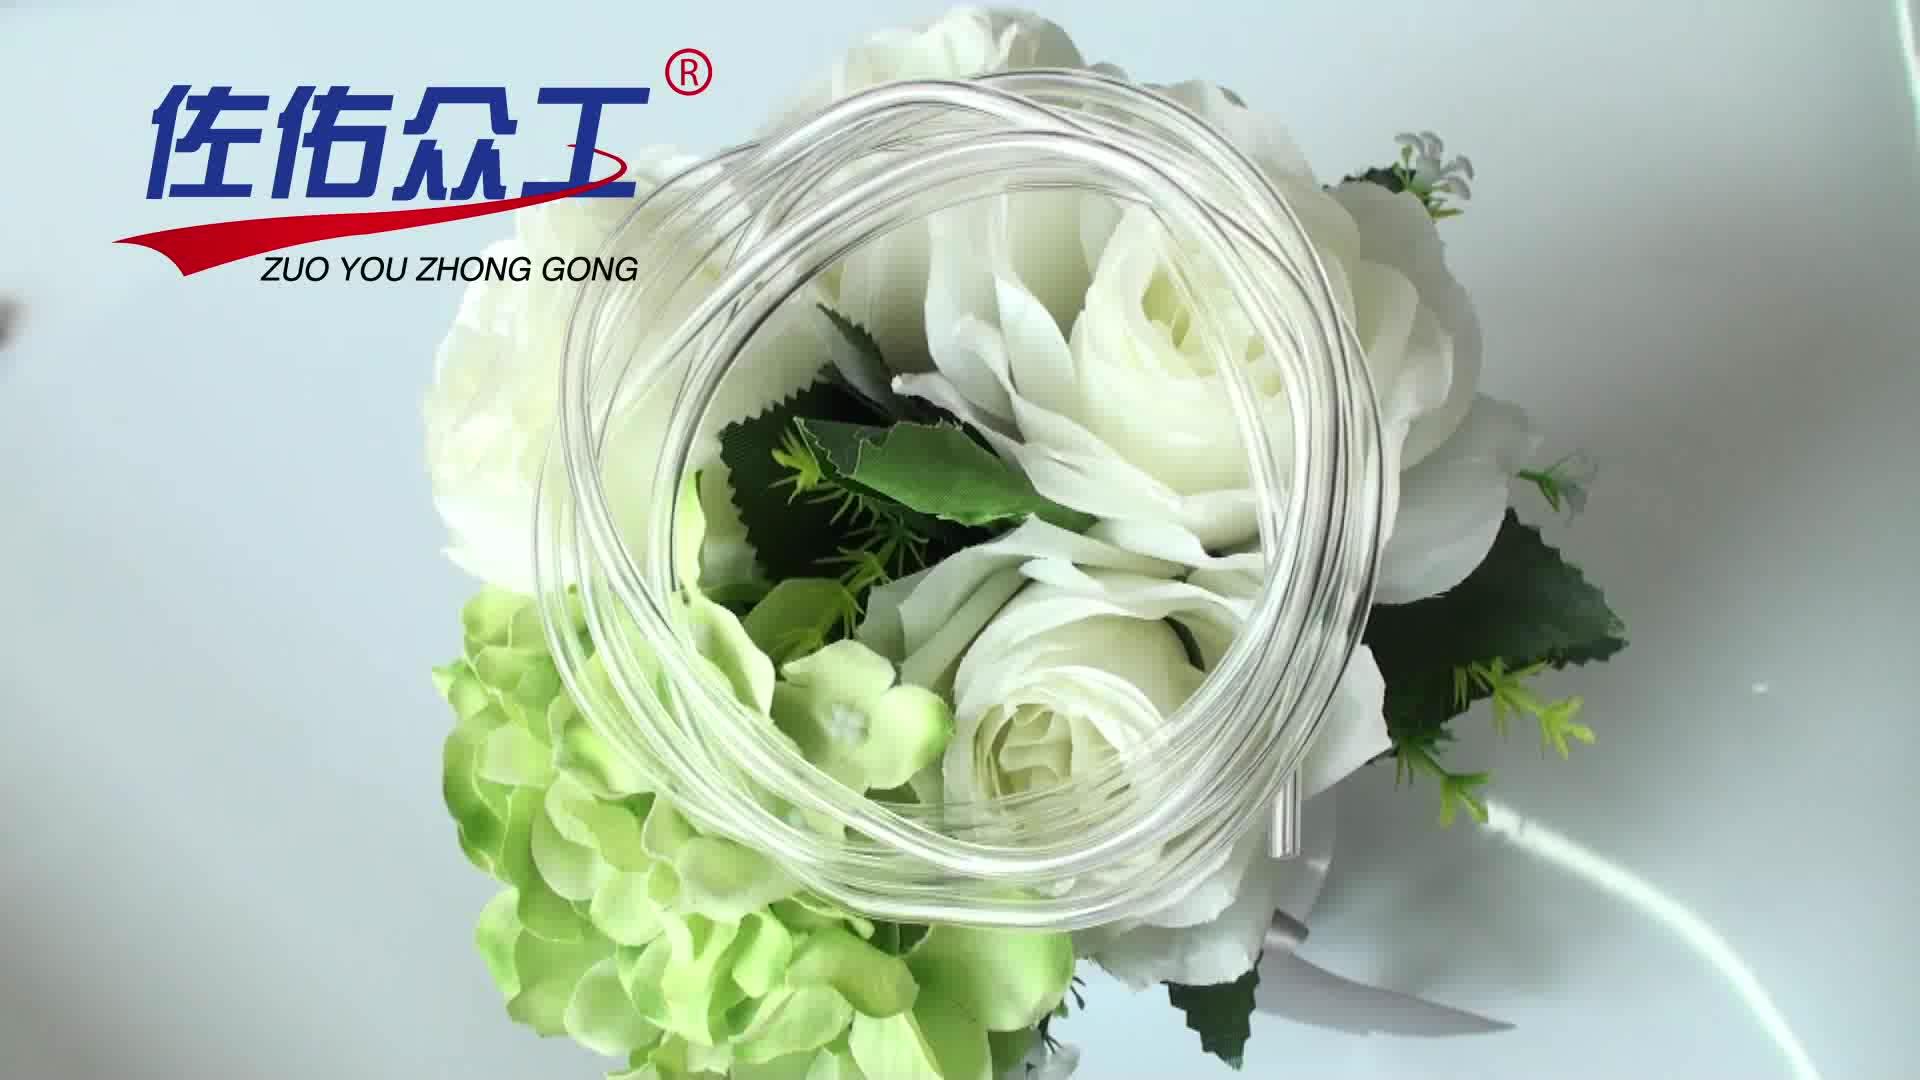 【PVC软管】生产PVC透明彩色塑料管 PVC电线套管水平管手袋提带